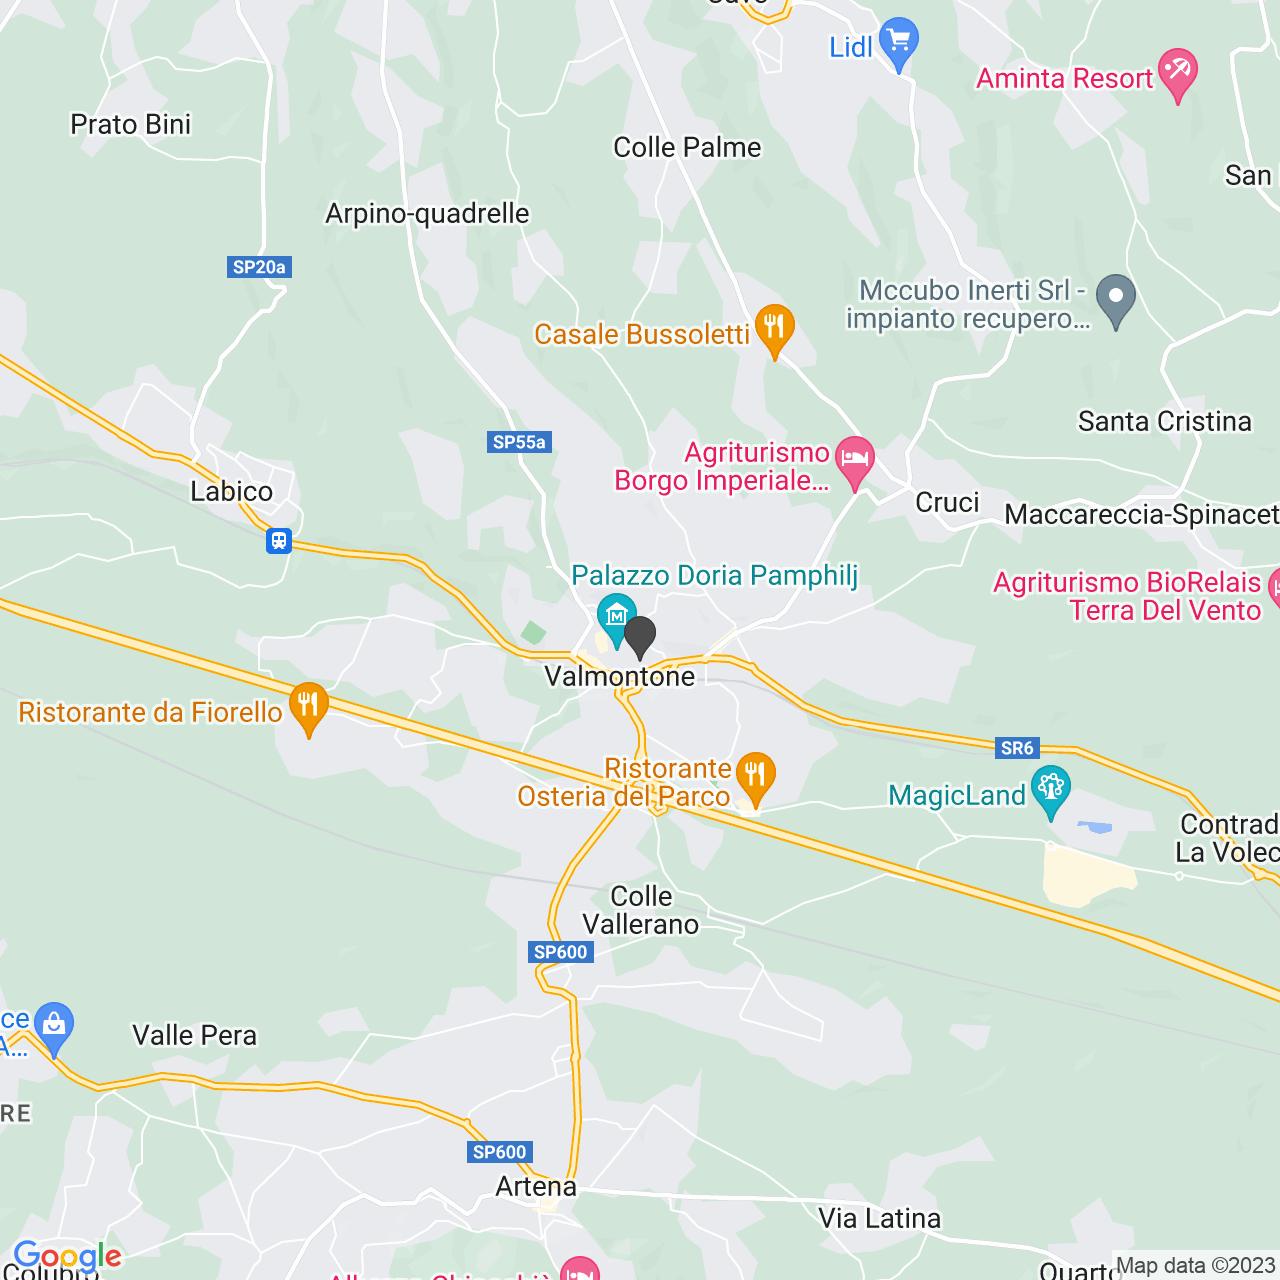 Chiesa di San Vincenzo de Paoli